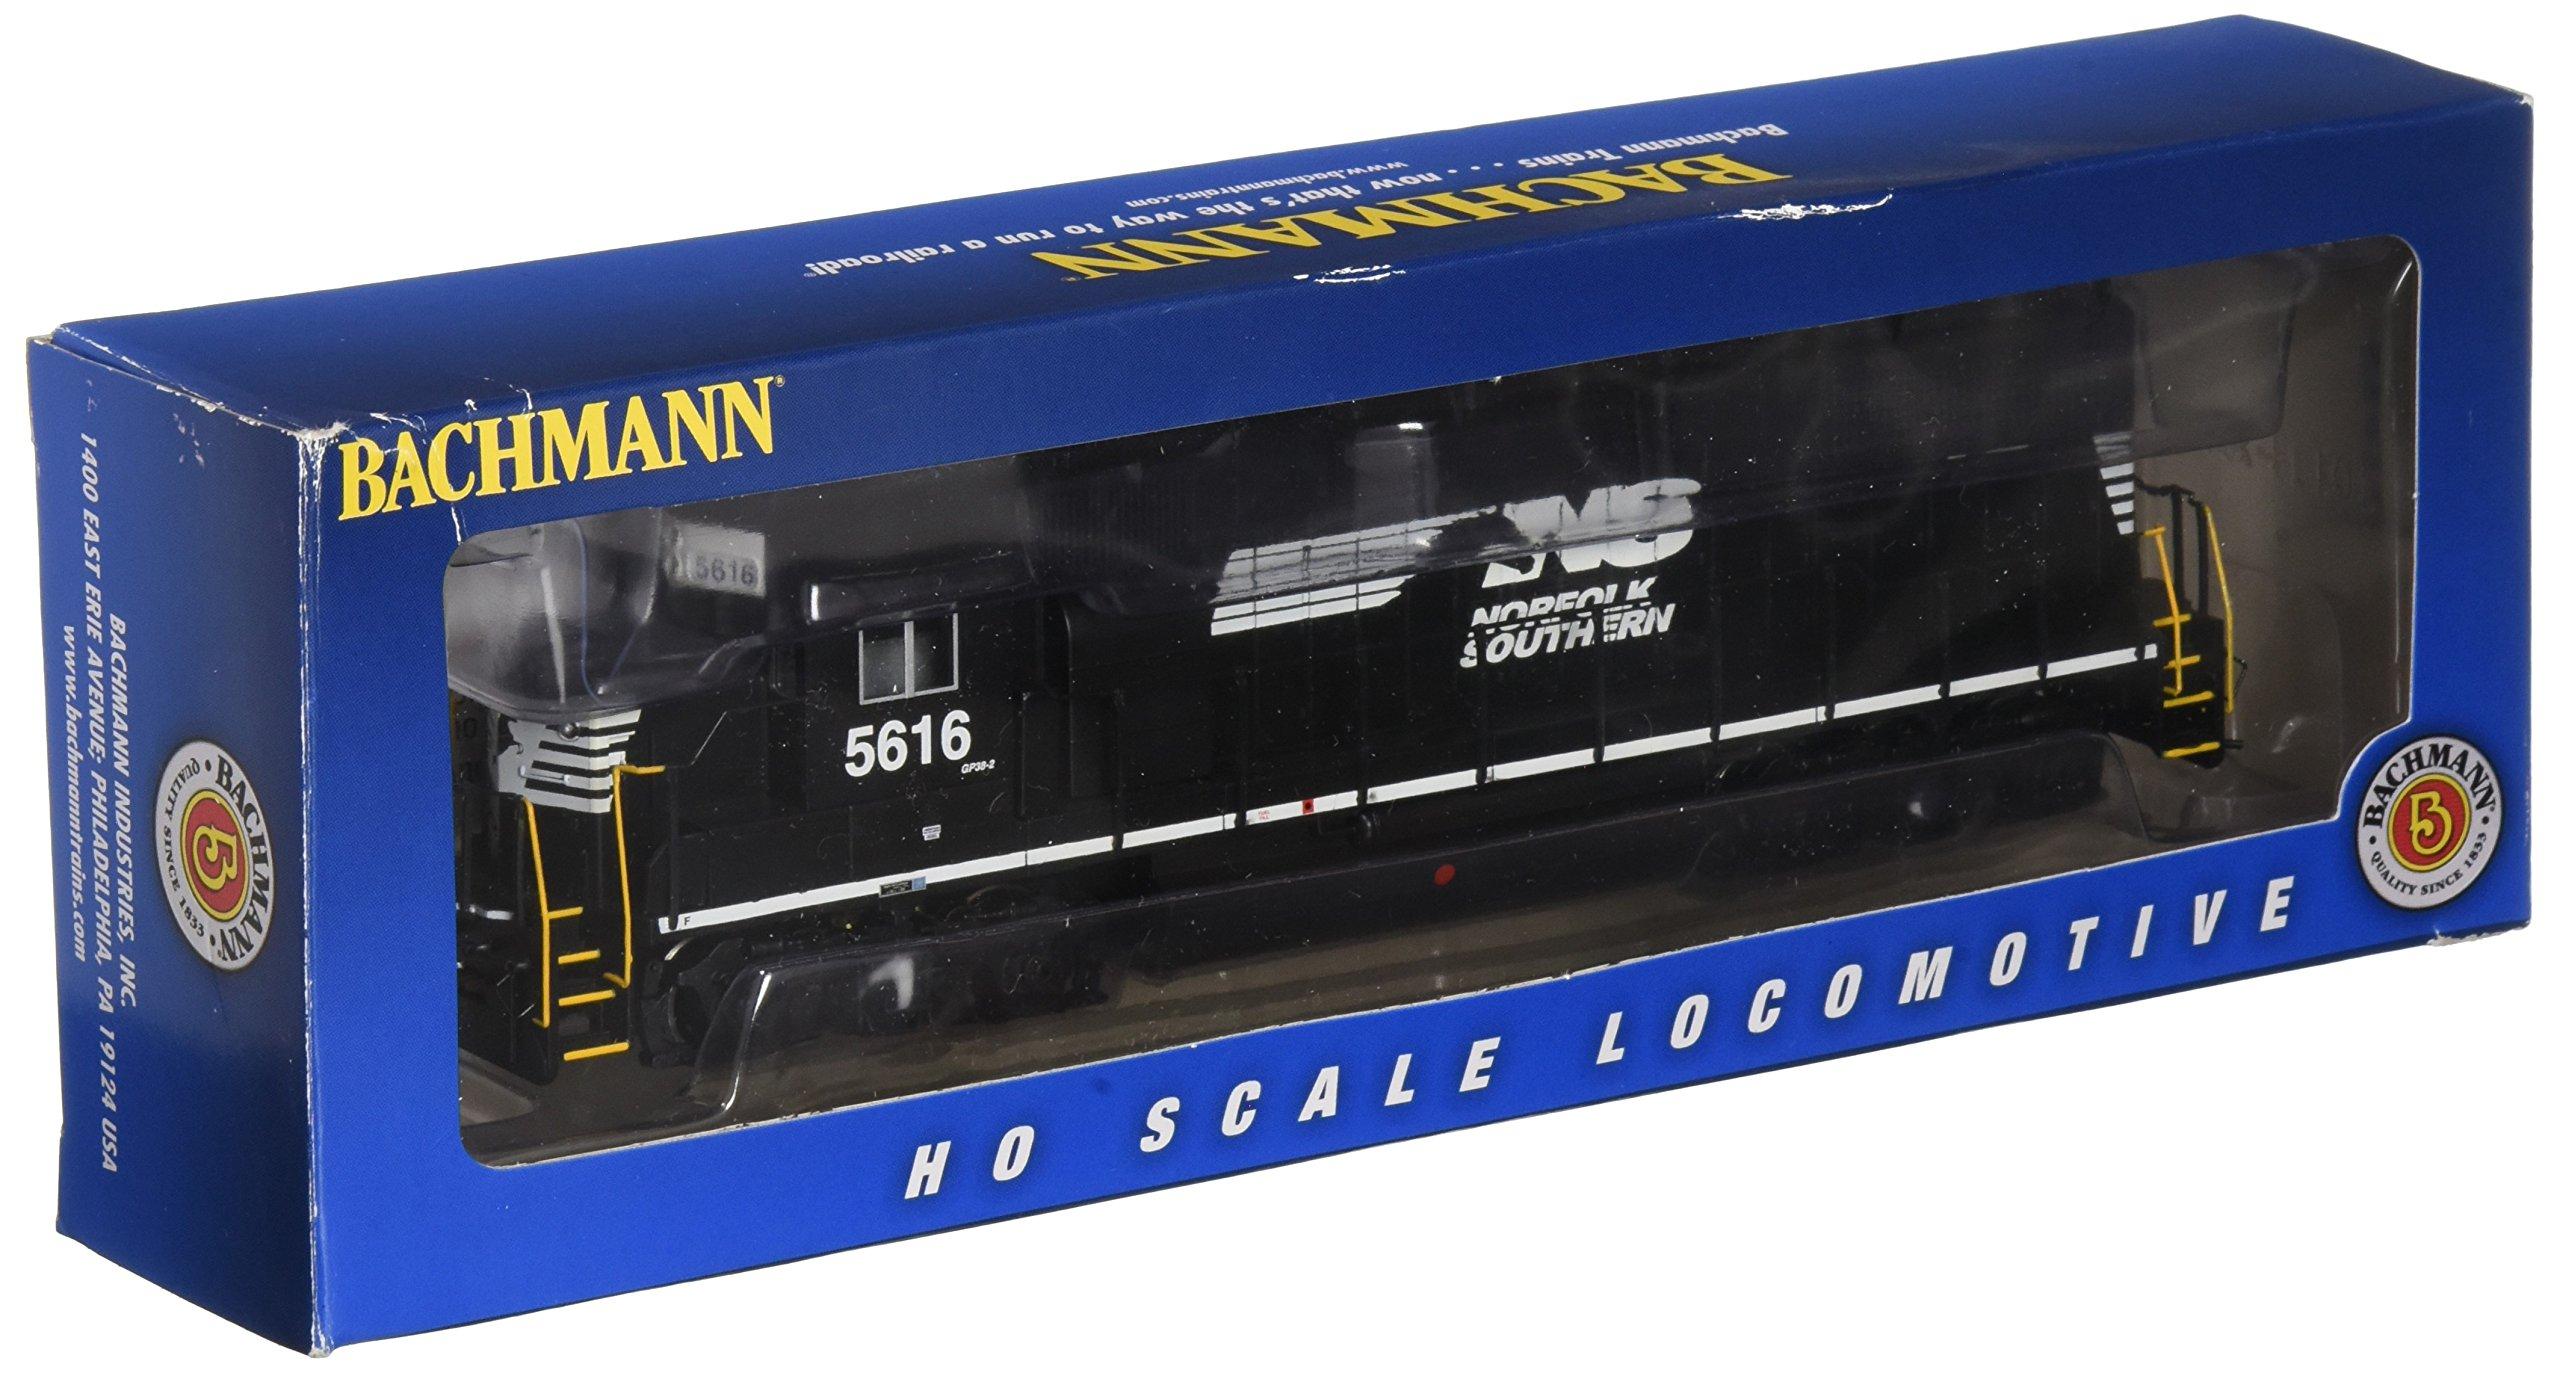 Bachmann Industries EMD GP38 2 Norfolk Southern #5616 Locomotive (HO Scale)